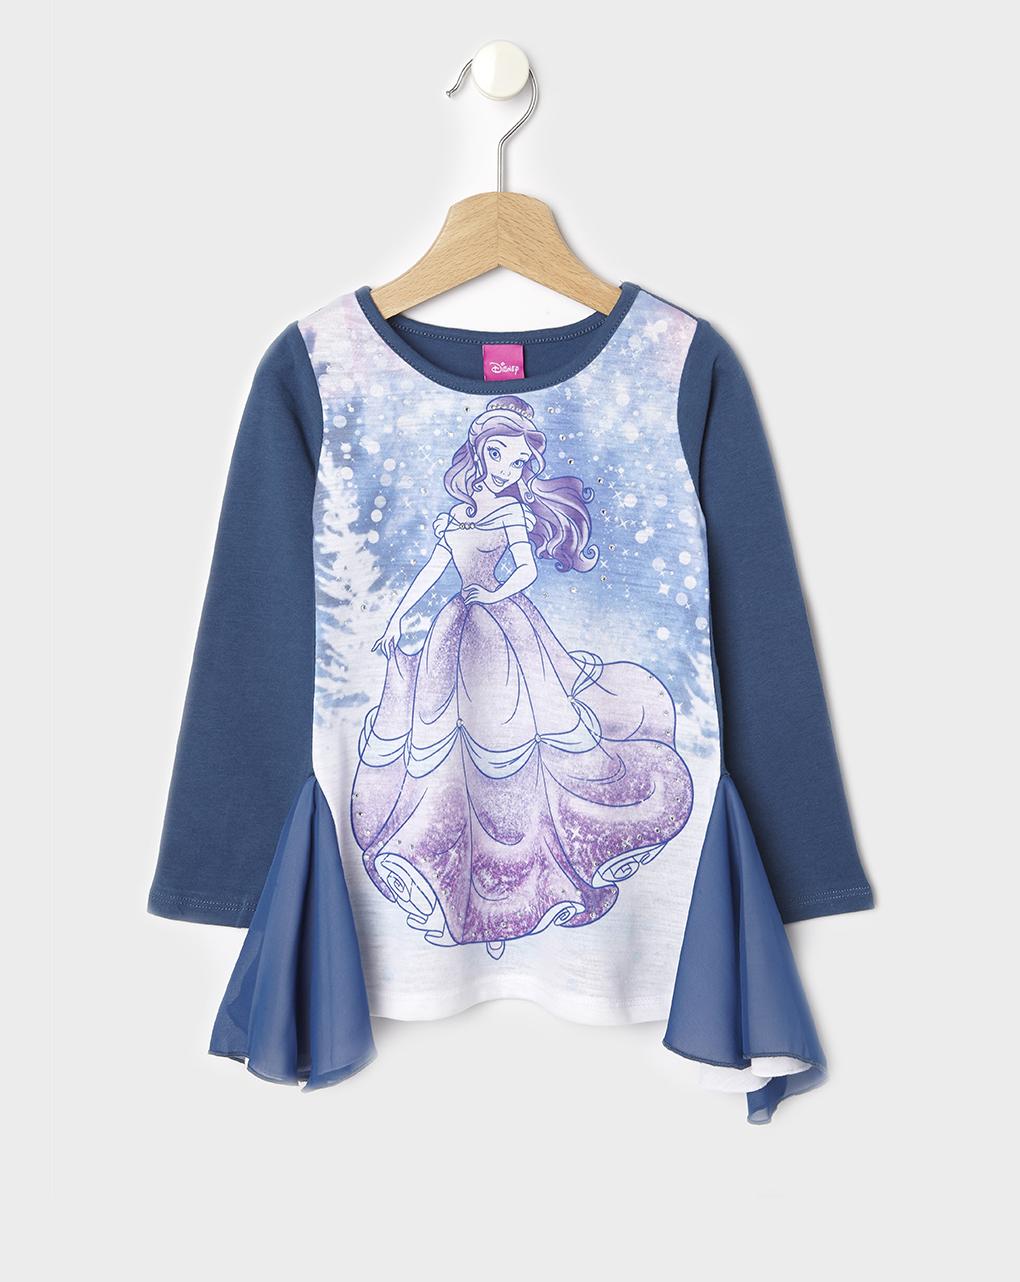 T-shirt Maxi Με Πριγκίπισσα Μπλε για Κορίτσι